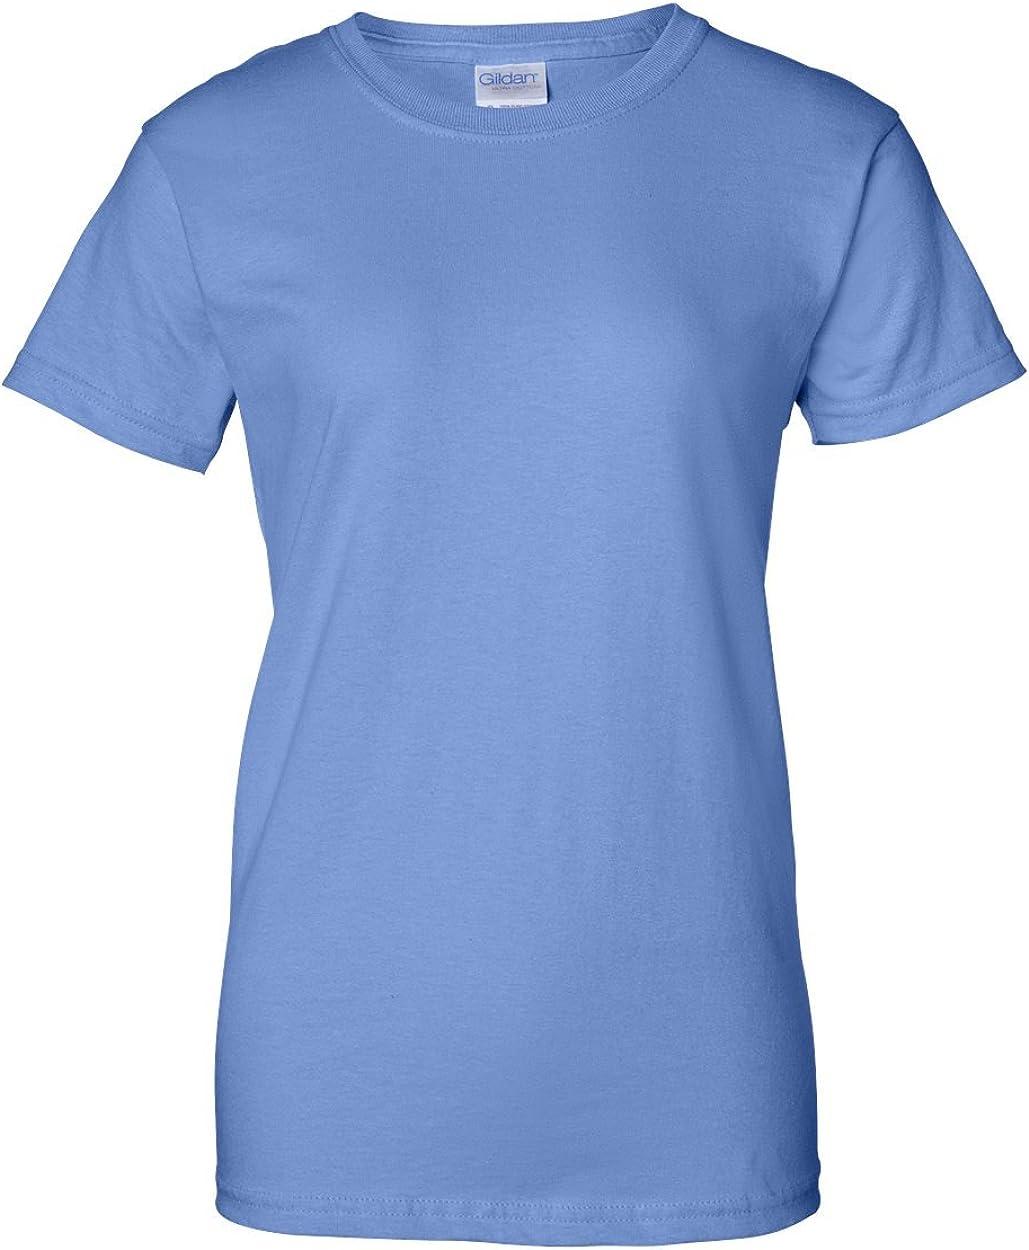 Gildan Womens Softstyle Short Sleeve Crew Neck Cotton T-Shirt Ladies Fit Top New